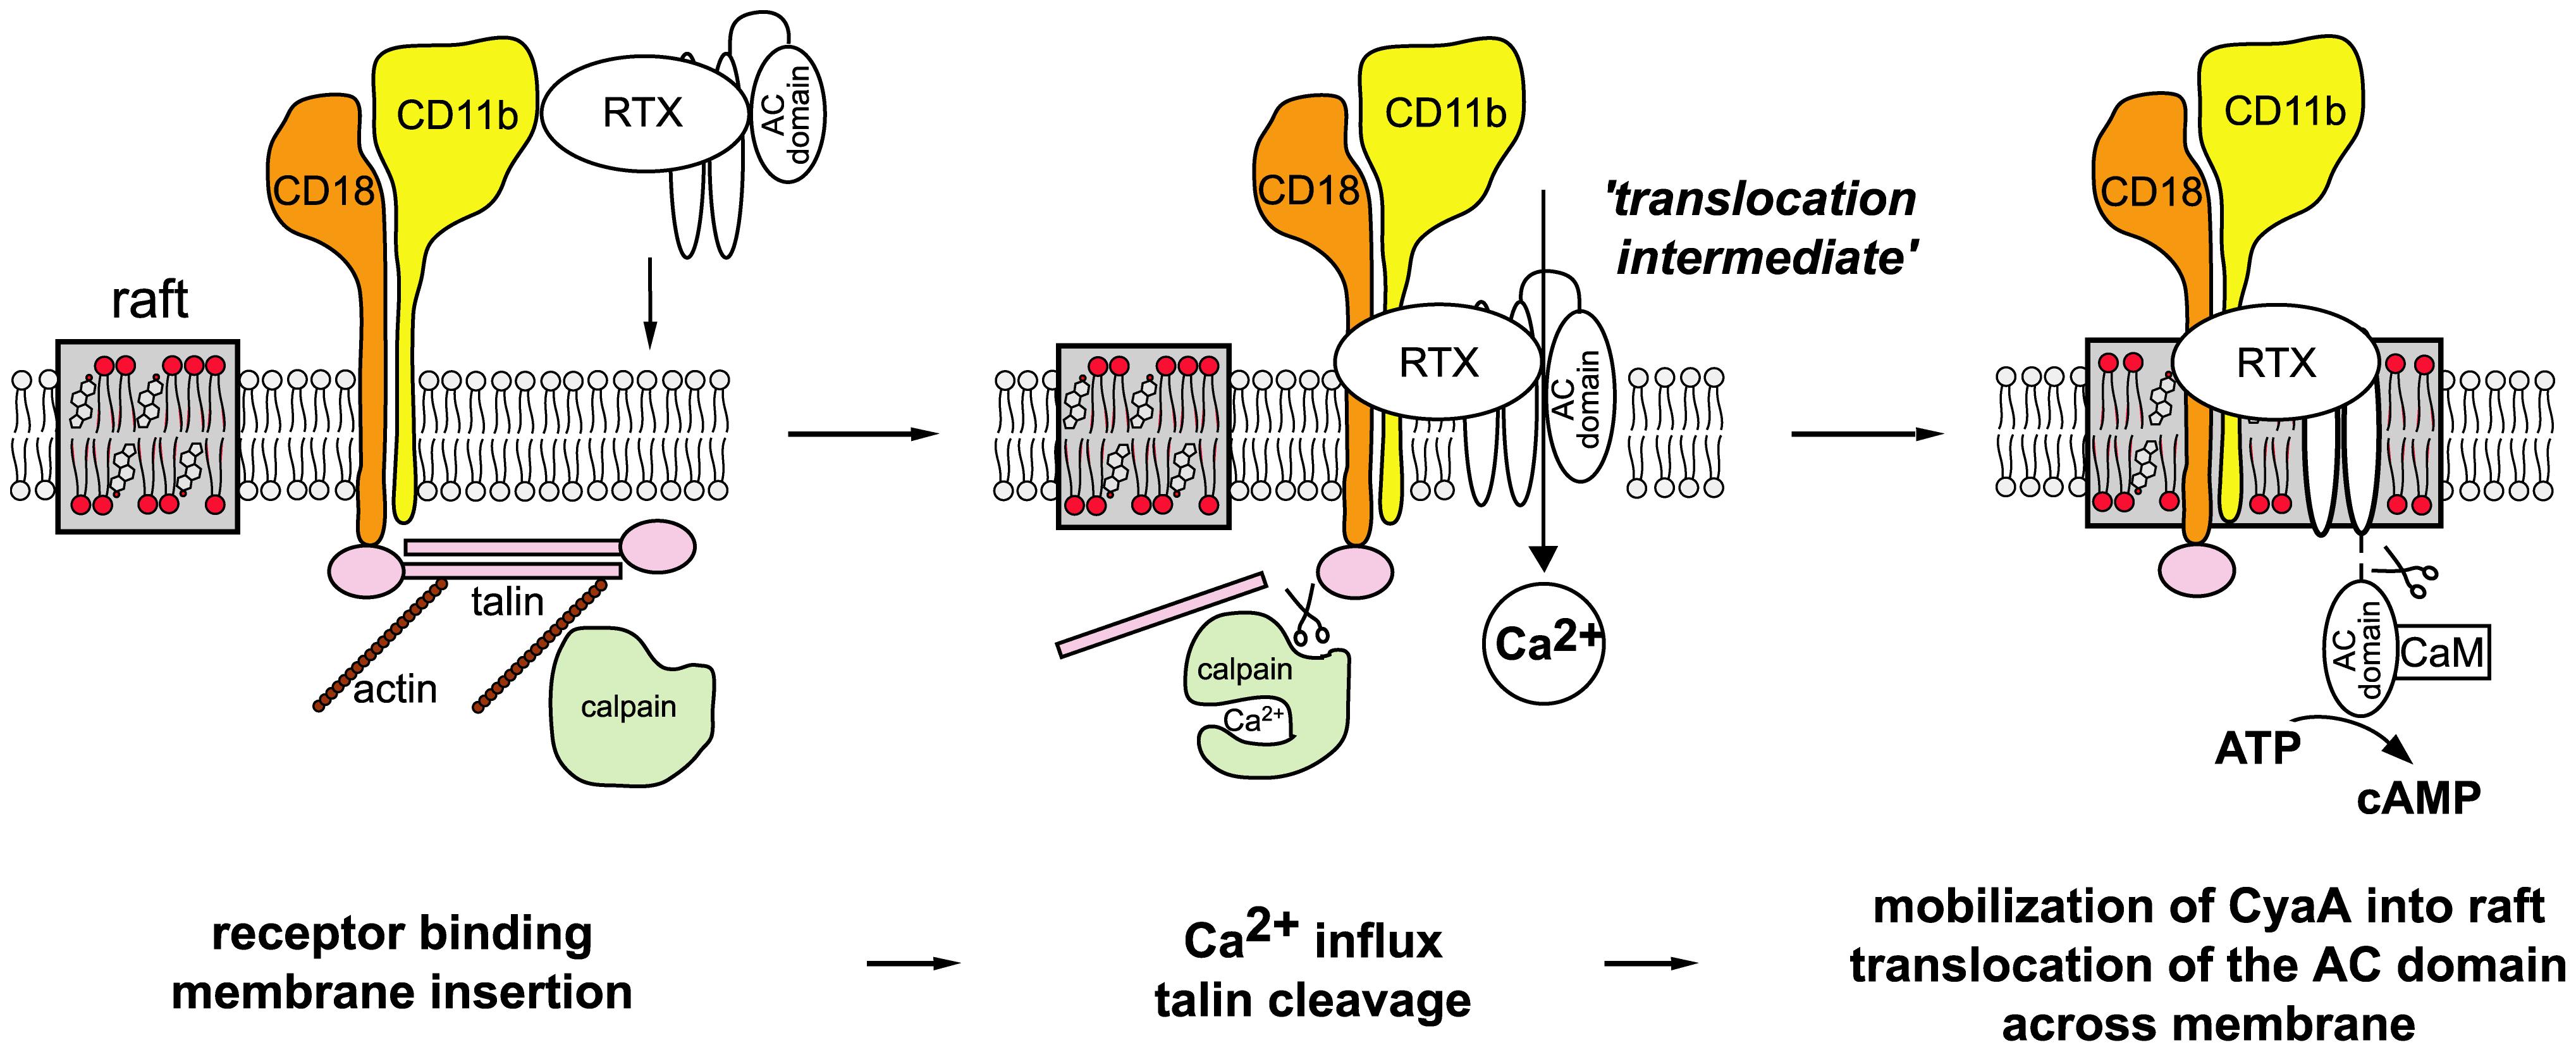 Model of CyaA translocation across target cell membrane.